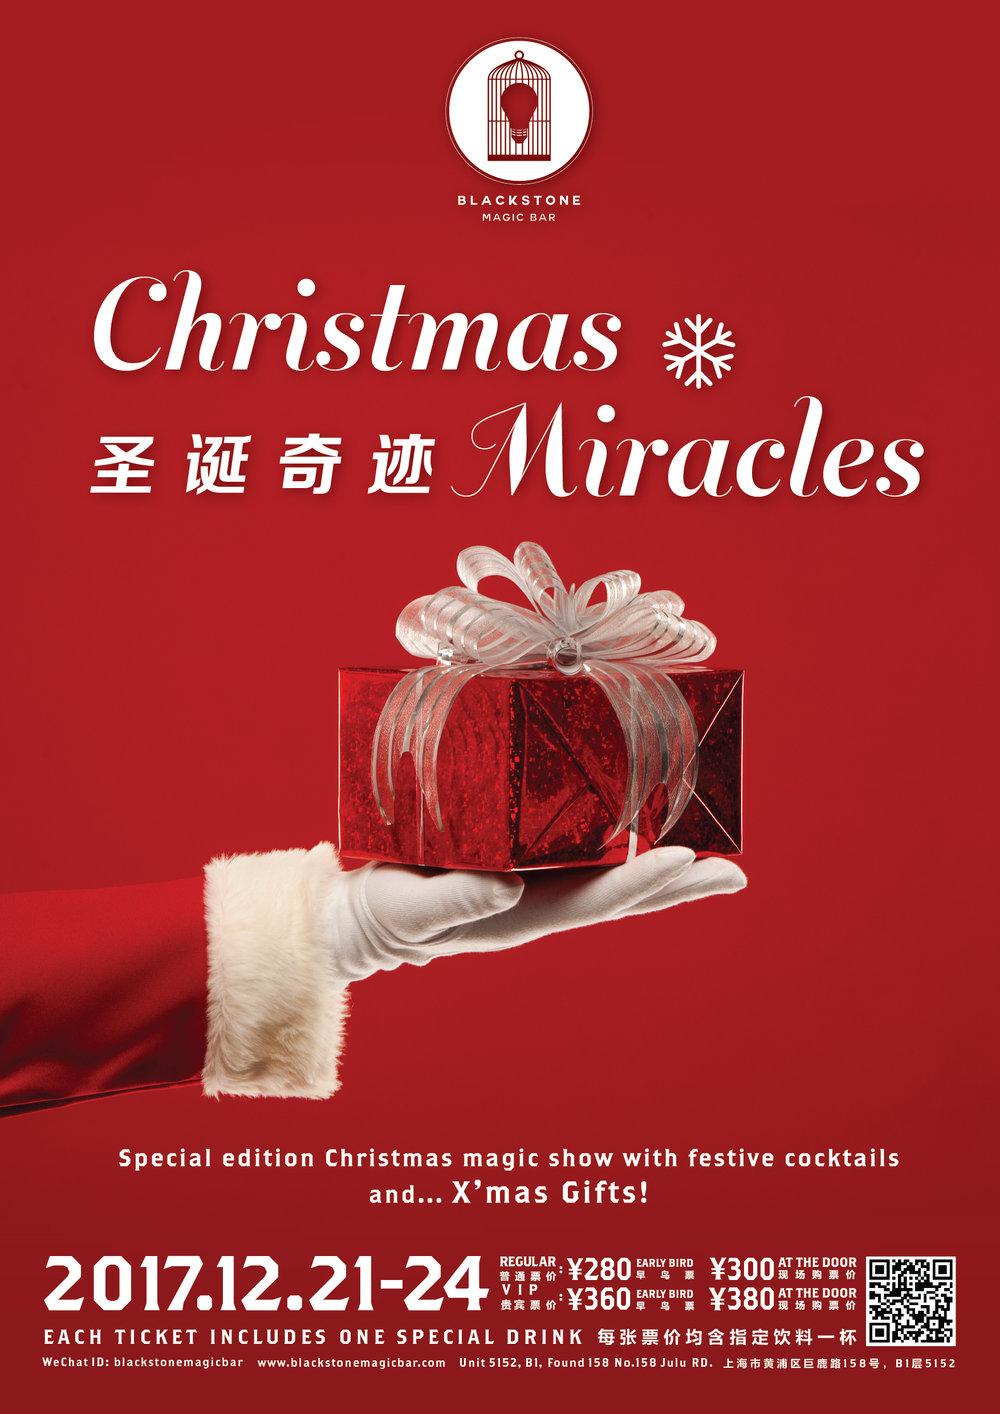 BLACKSTONE LIVE - 圣诞特别演出《CHRISTMAS MIRACLES》